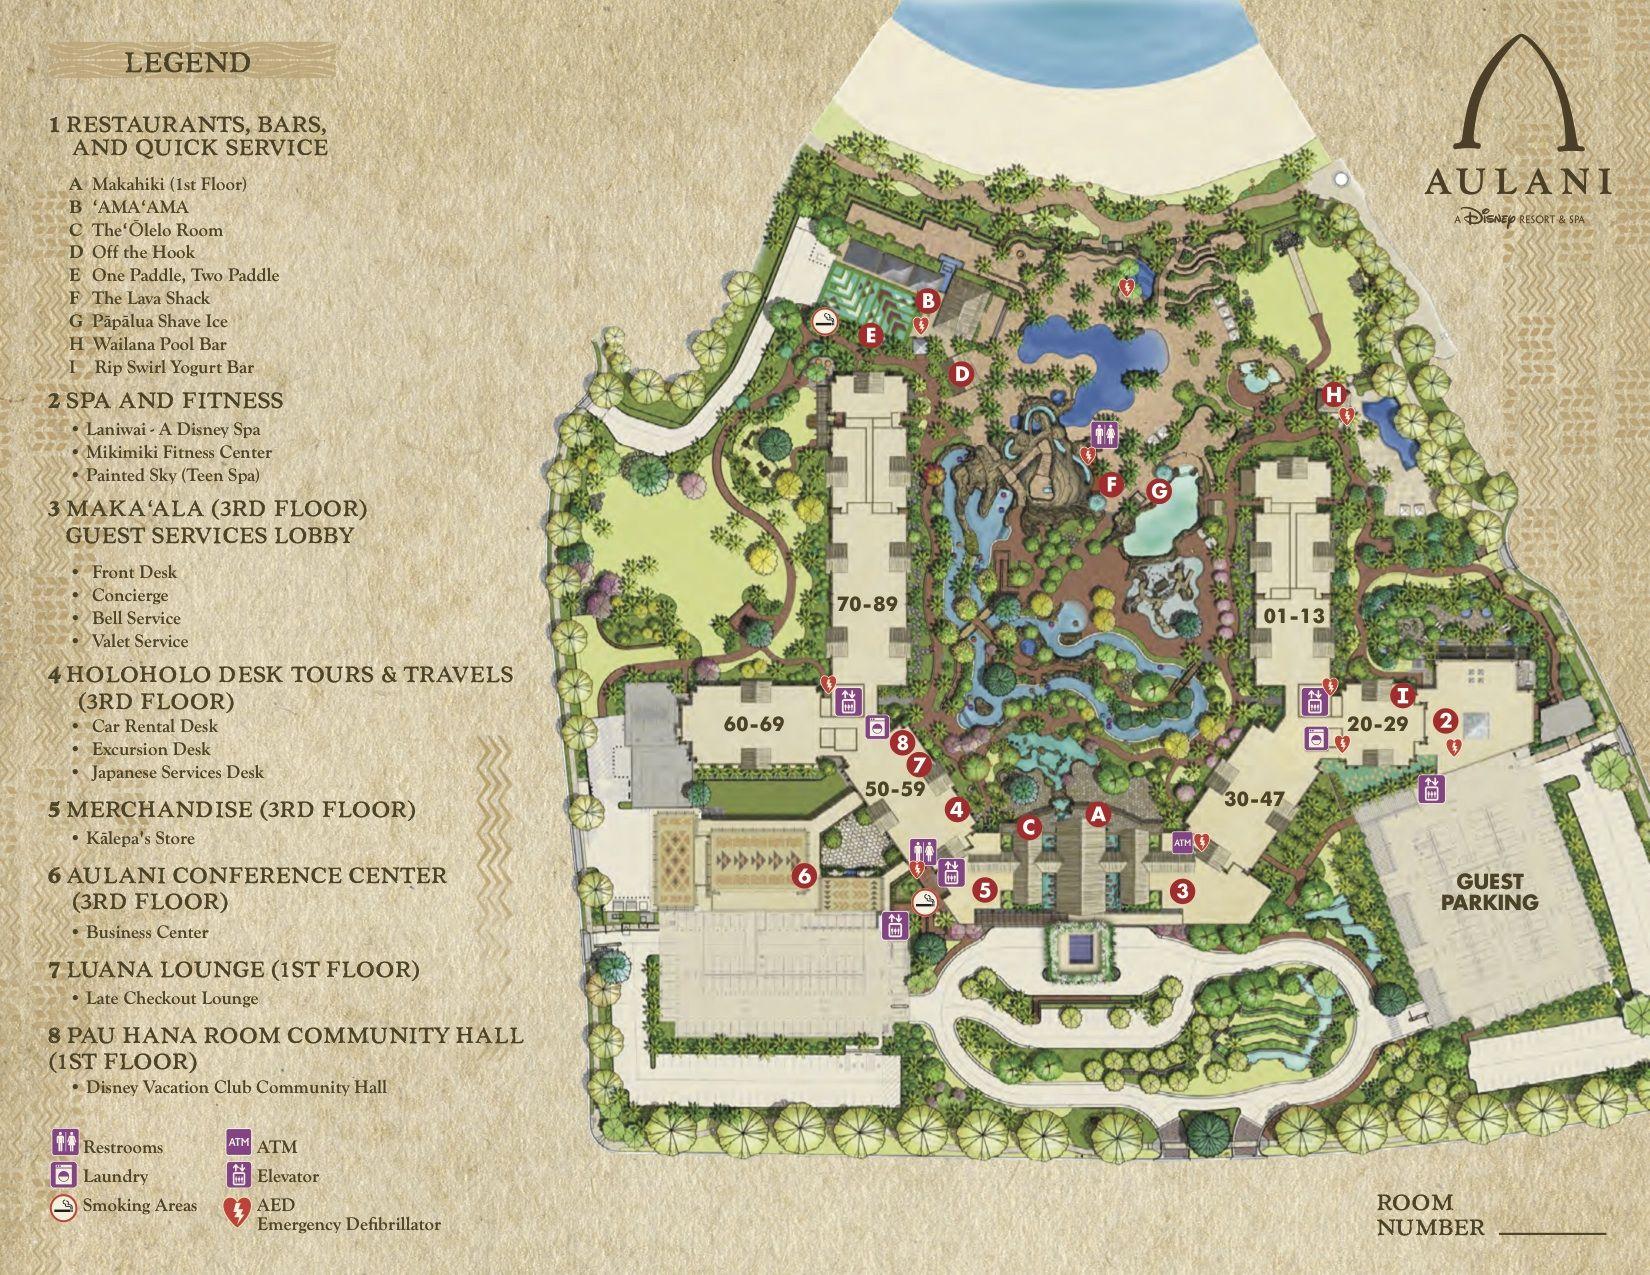 DVC Aulani Resort Map | Aulani Hawaii DVC | Disney resorts, Disney